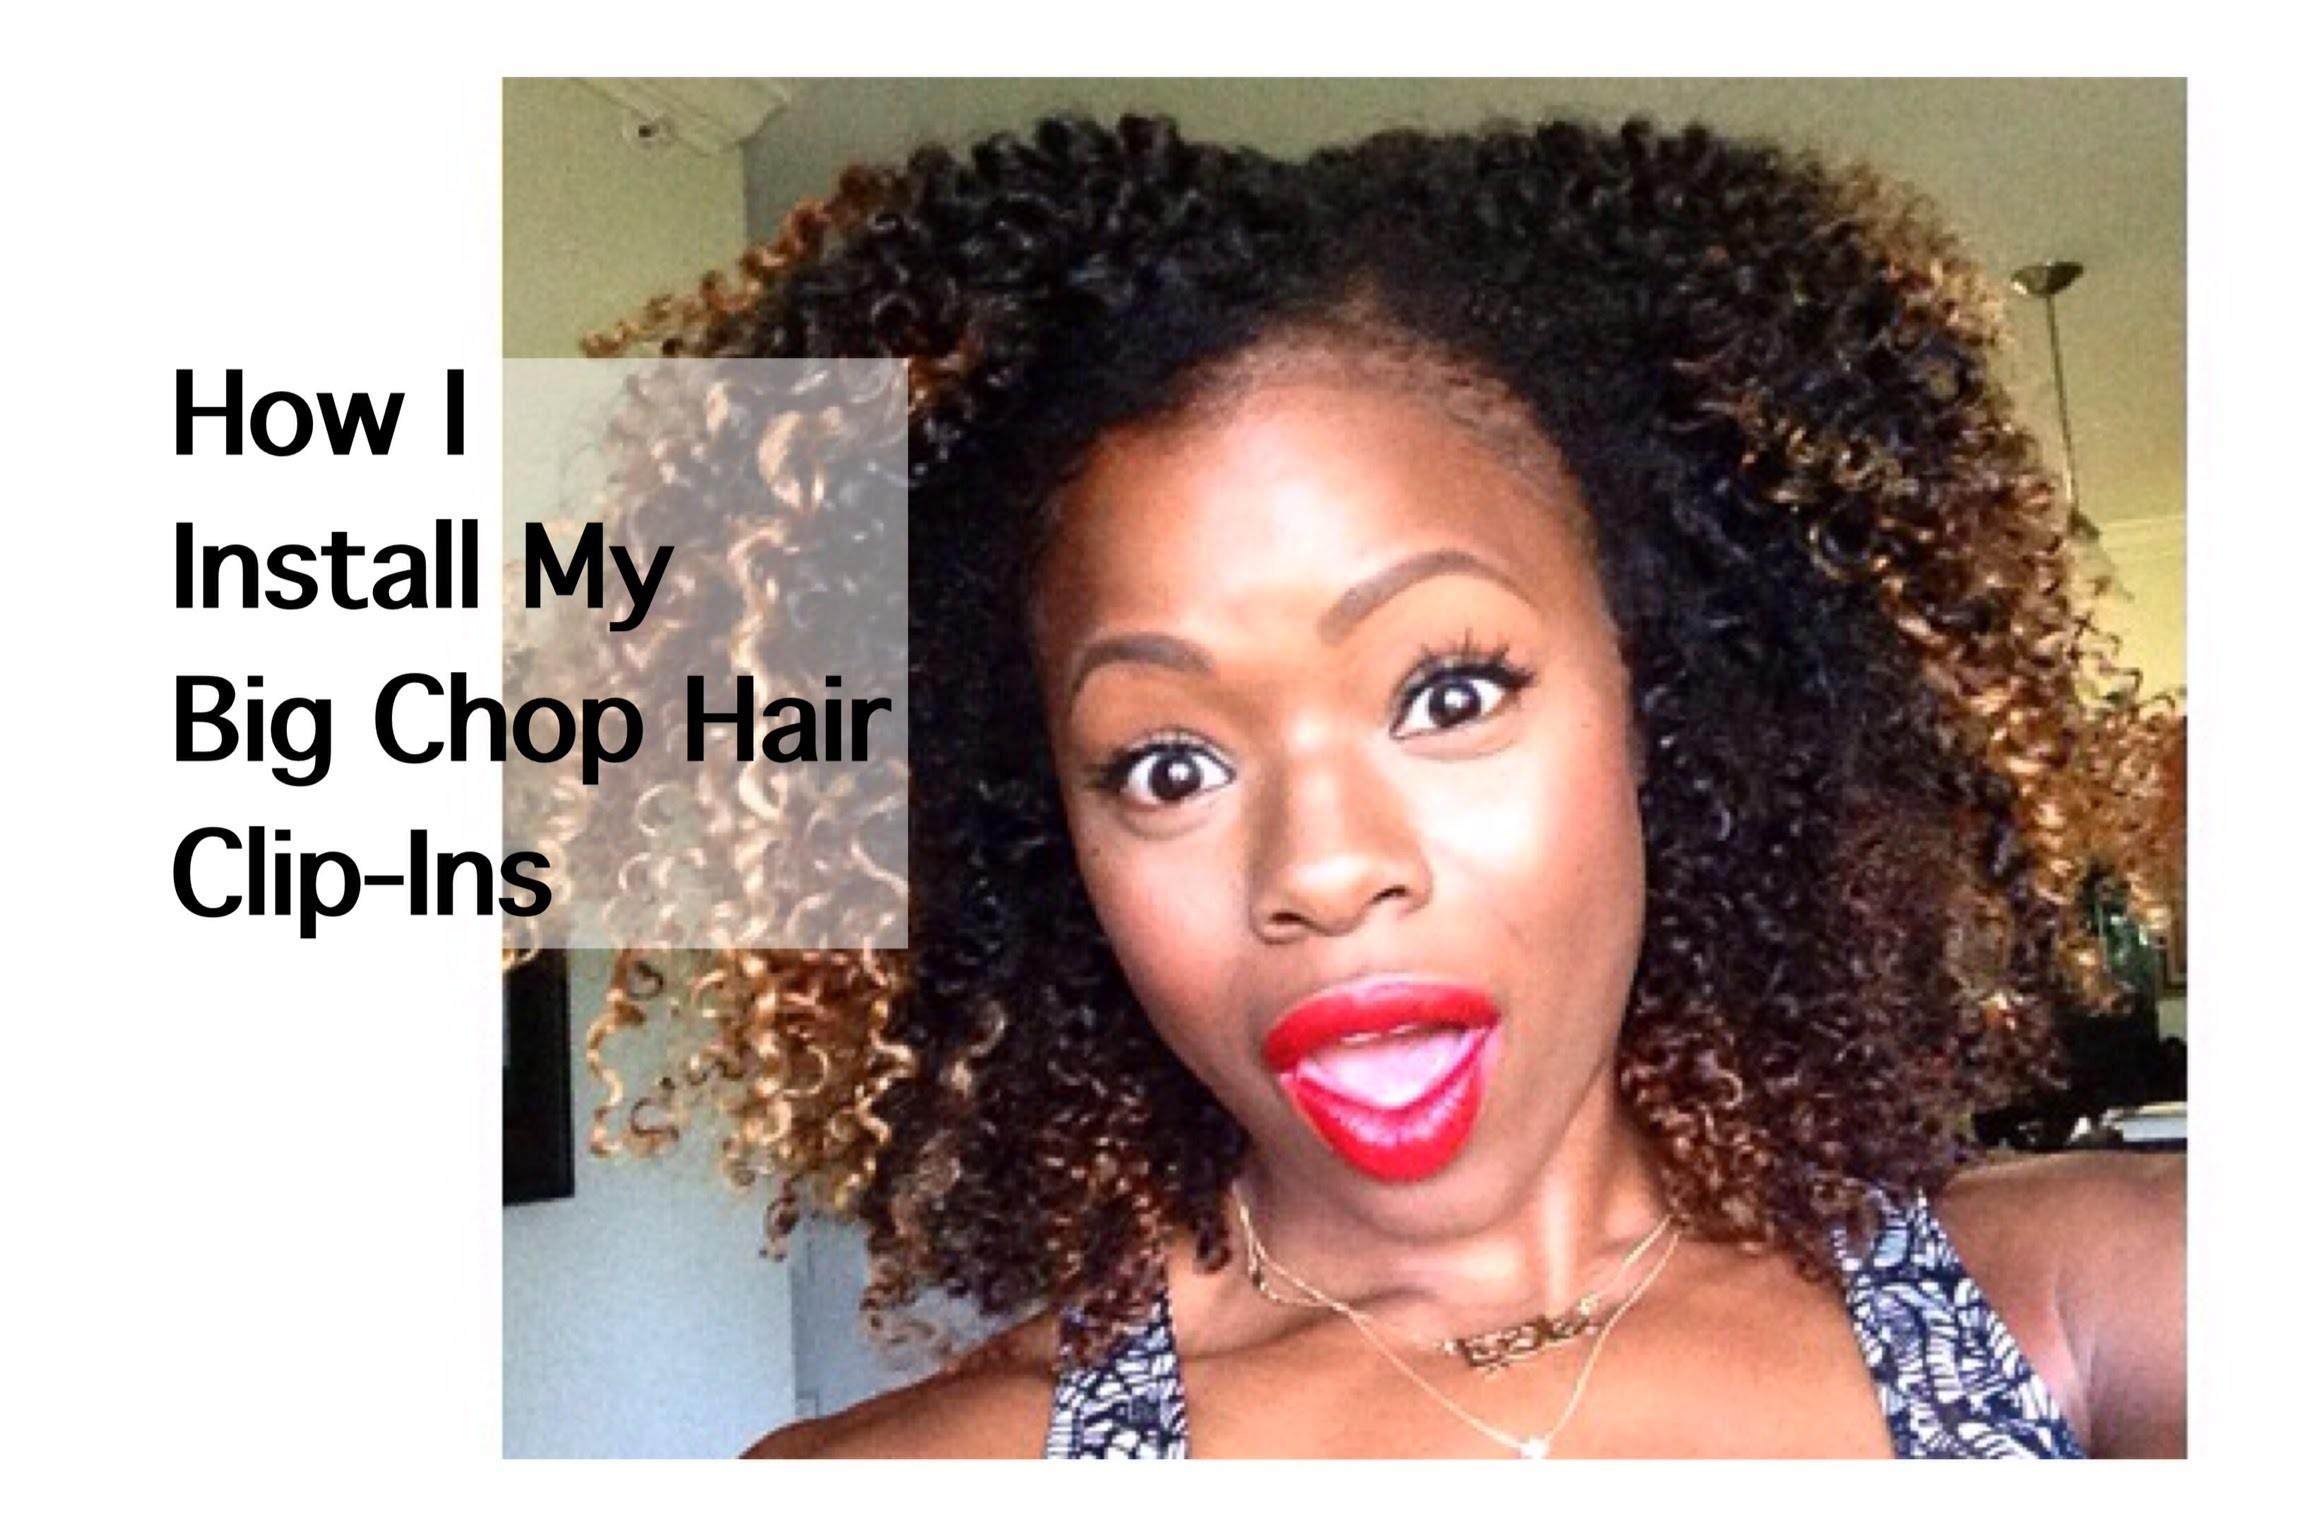 How I Install My Big Chop Hair Clip-Ins | MariaAntoinetteTV